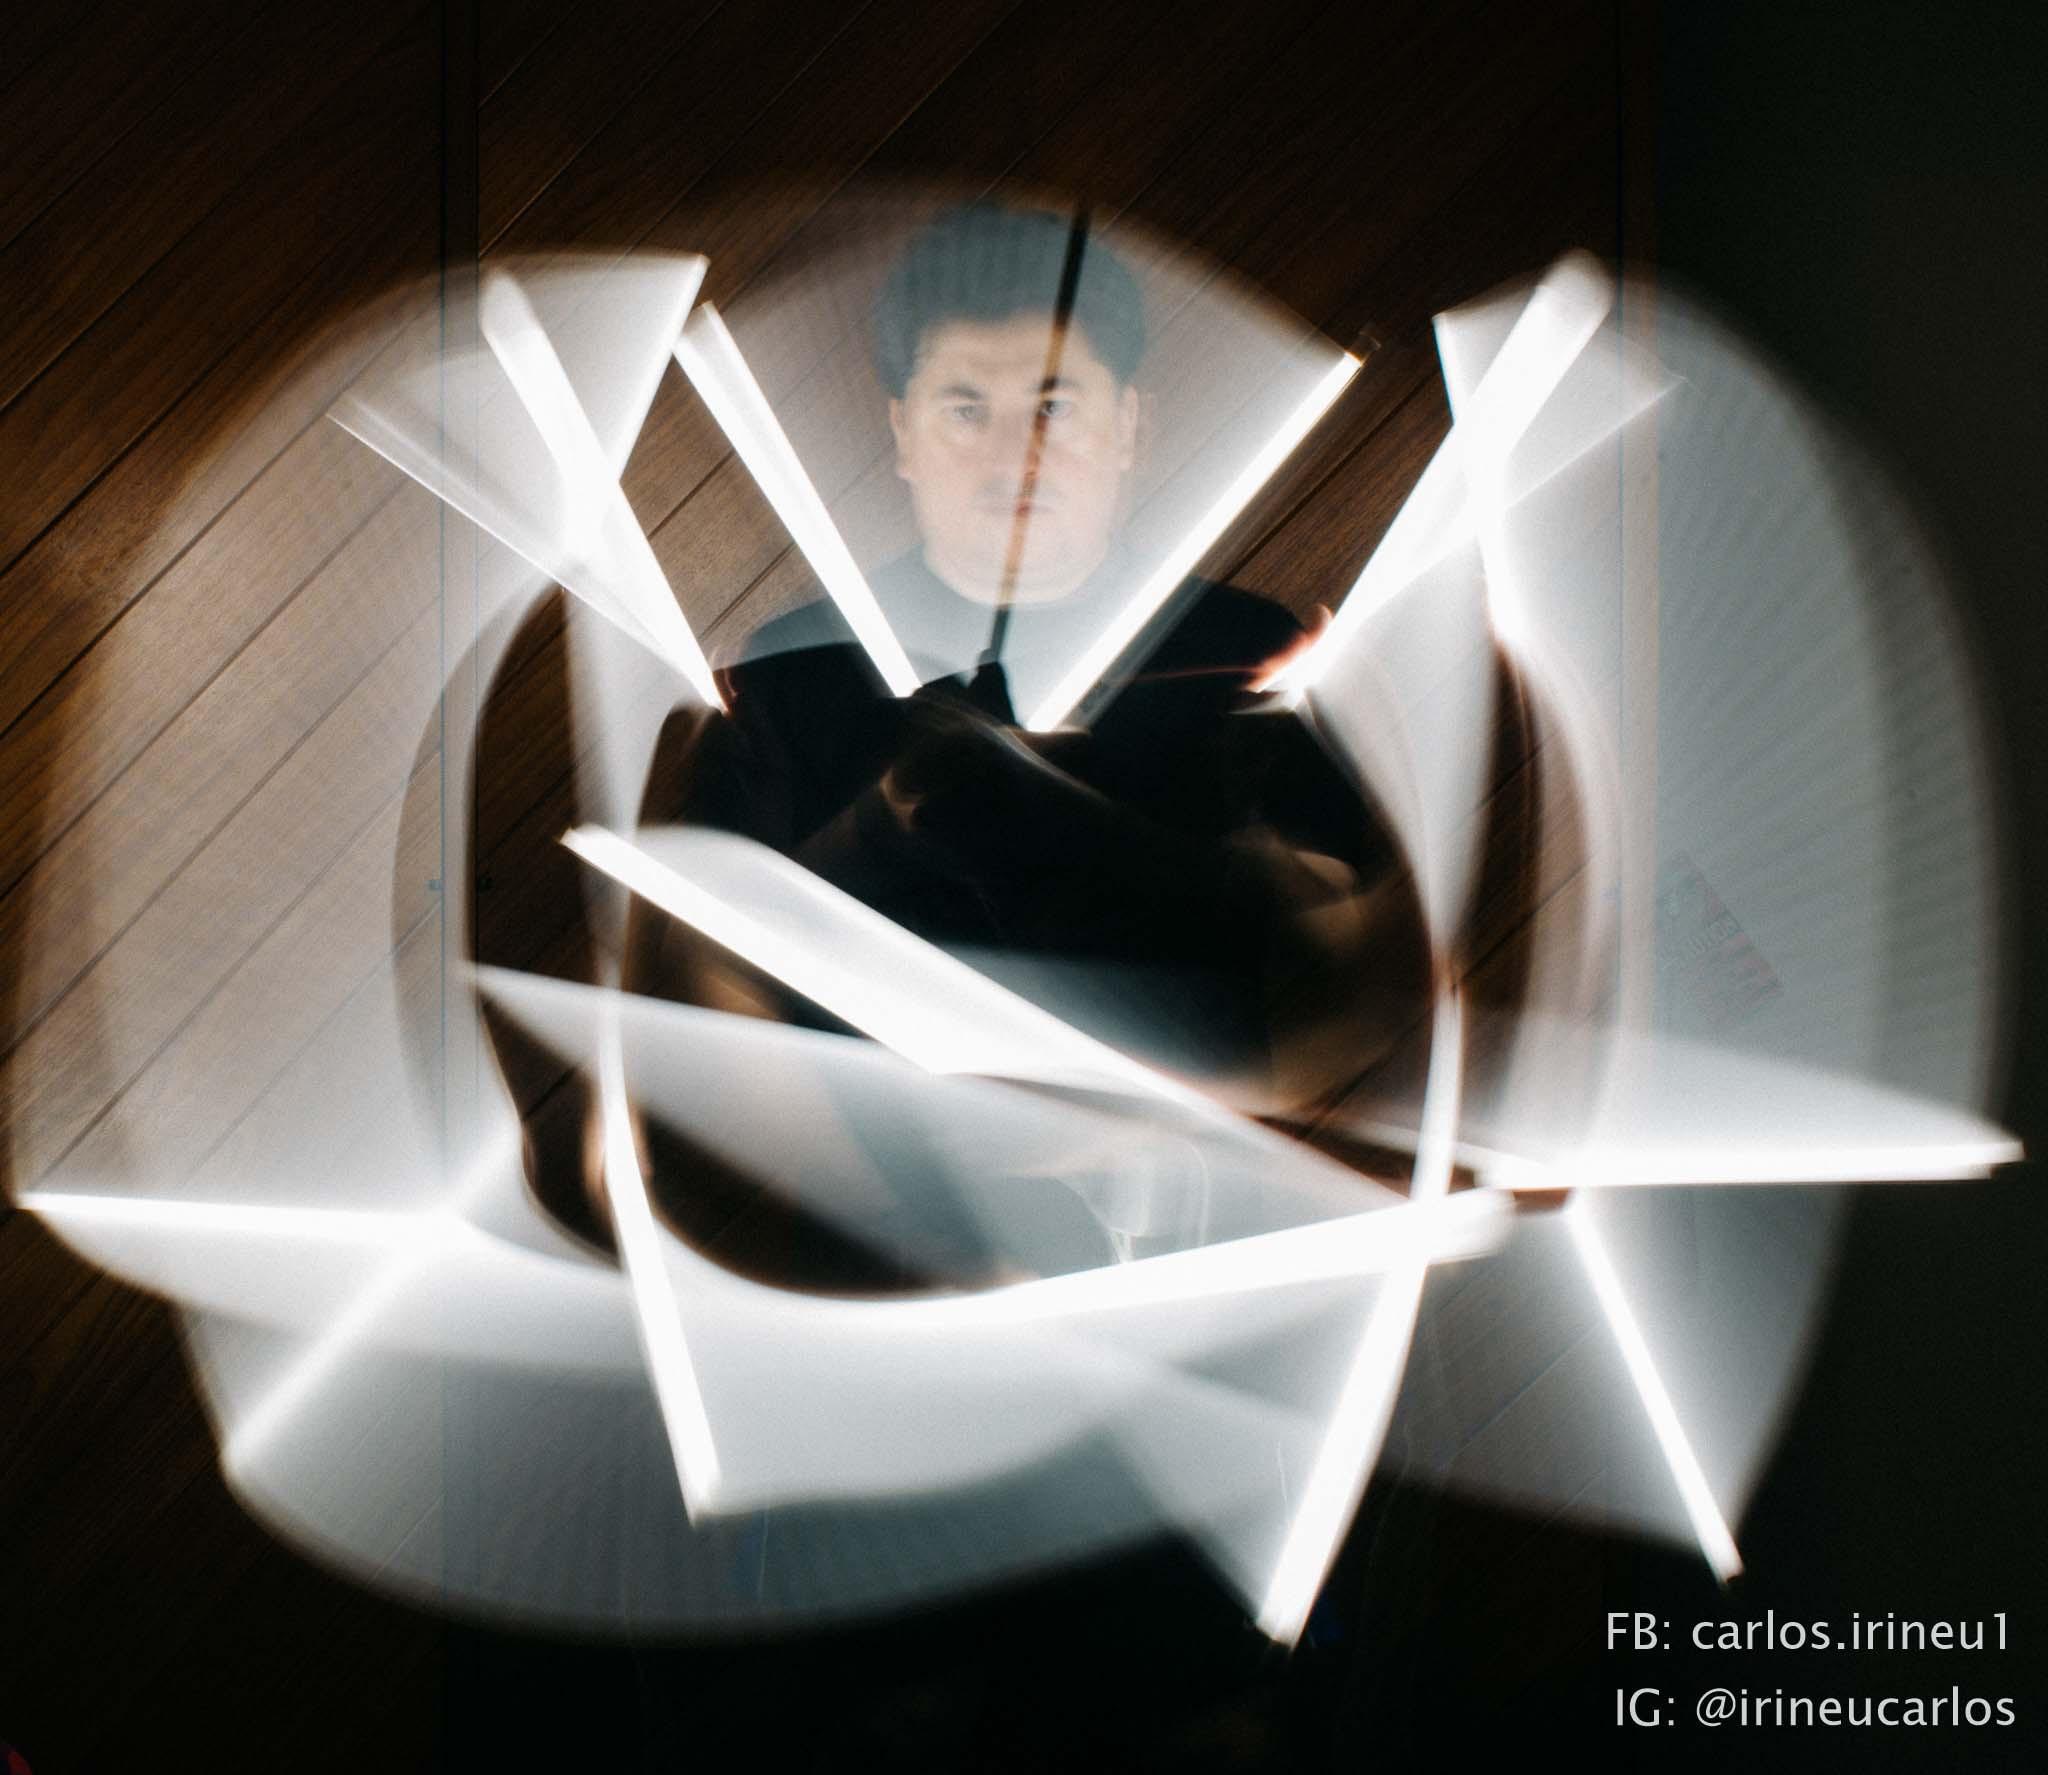 Go to Carlos Irineu da Costa's profile